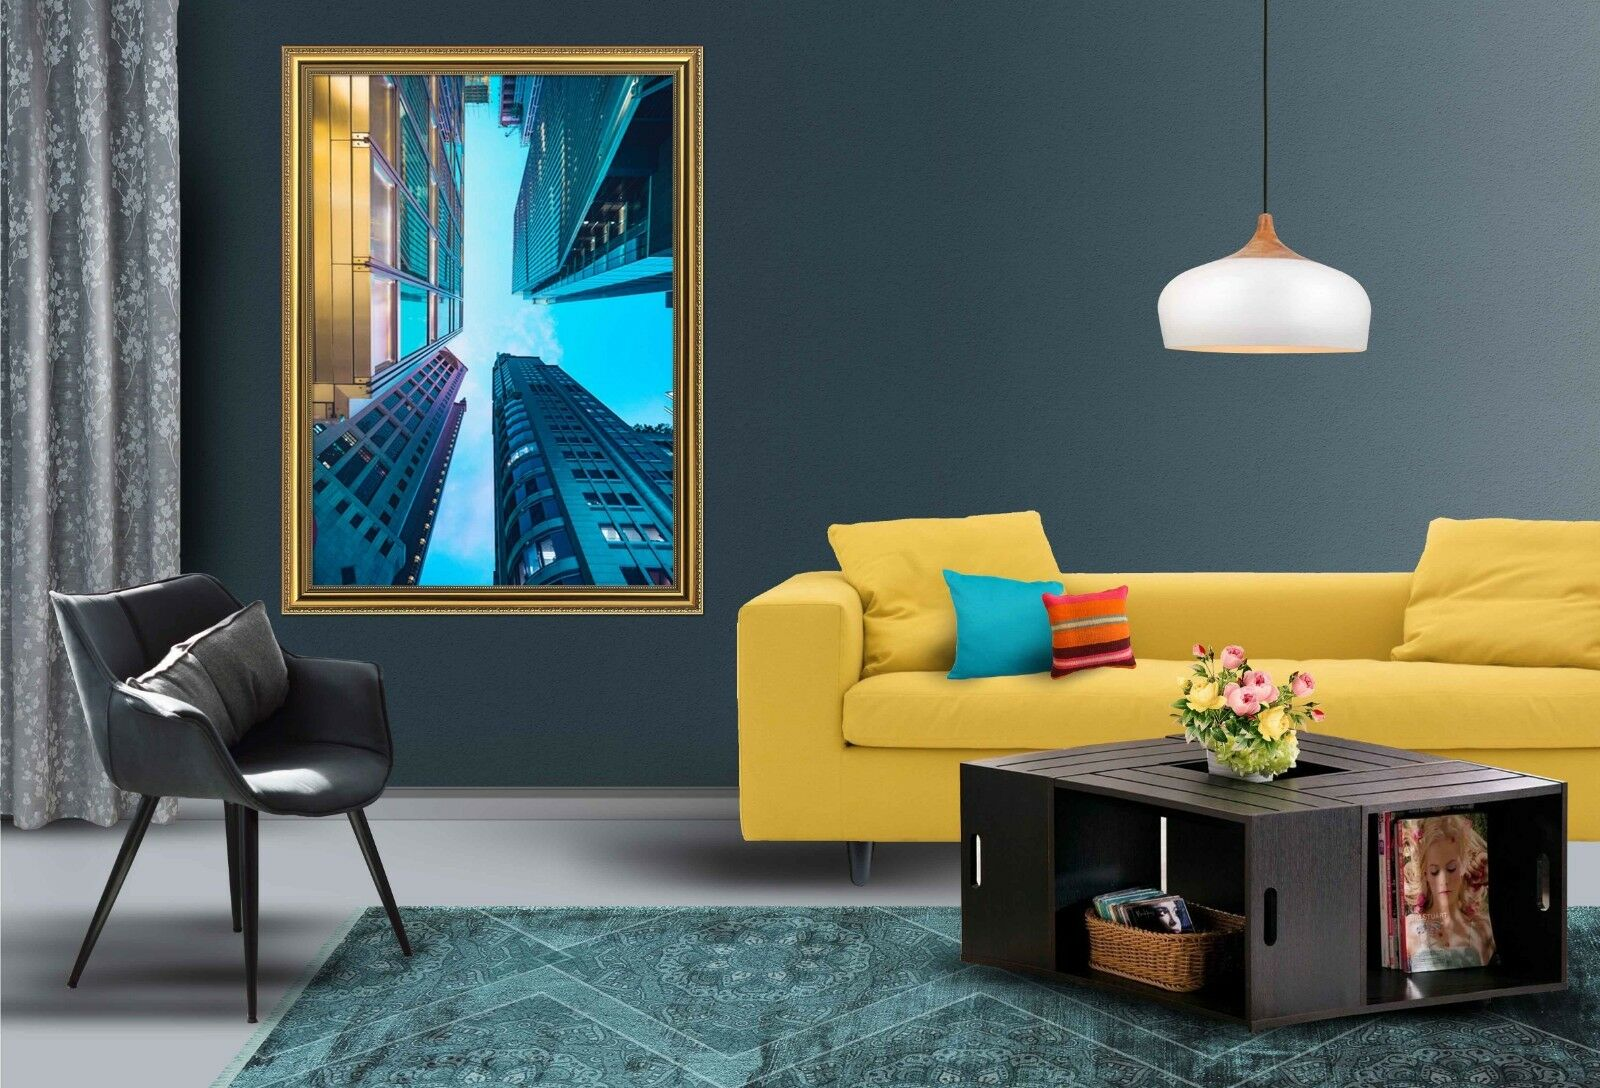 3D Buildings bleu Sky 2 Framed Poster Home Decor Print Painting Art AJ WALLPAPER